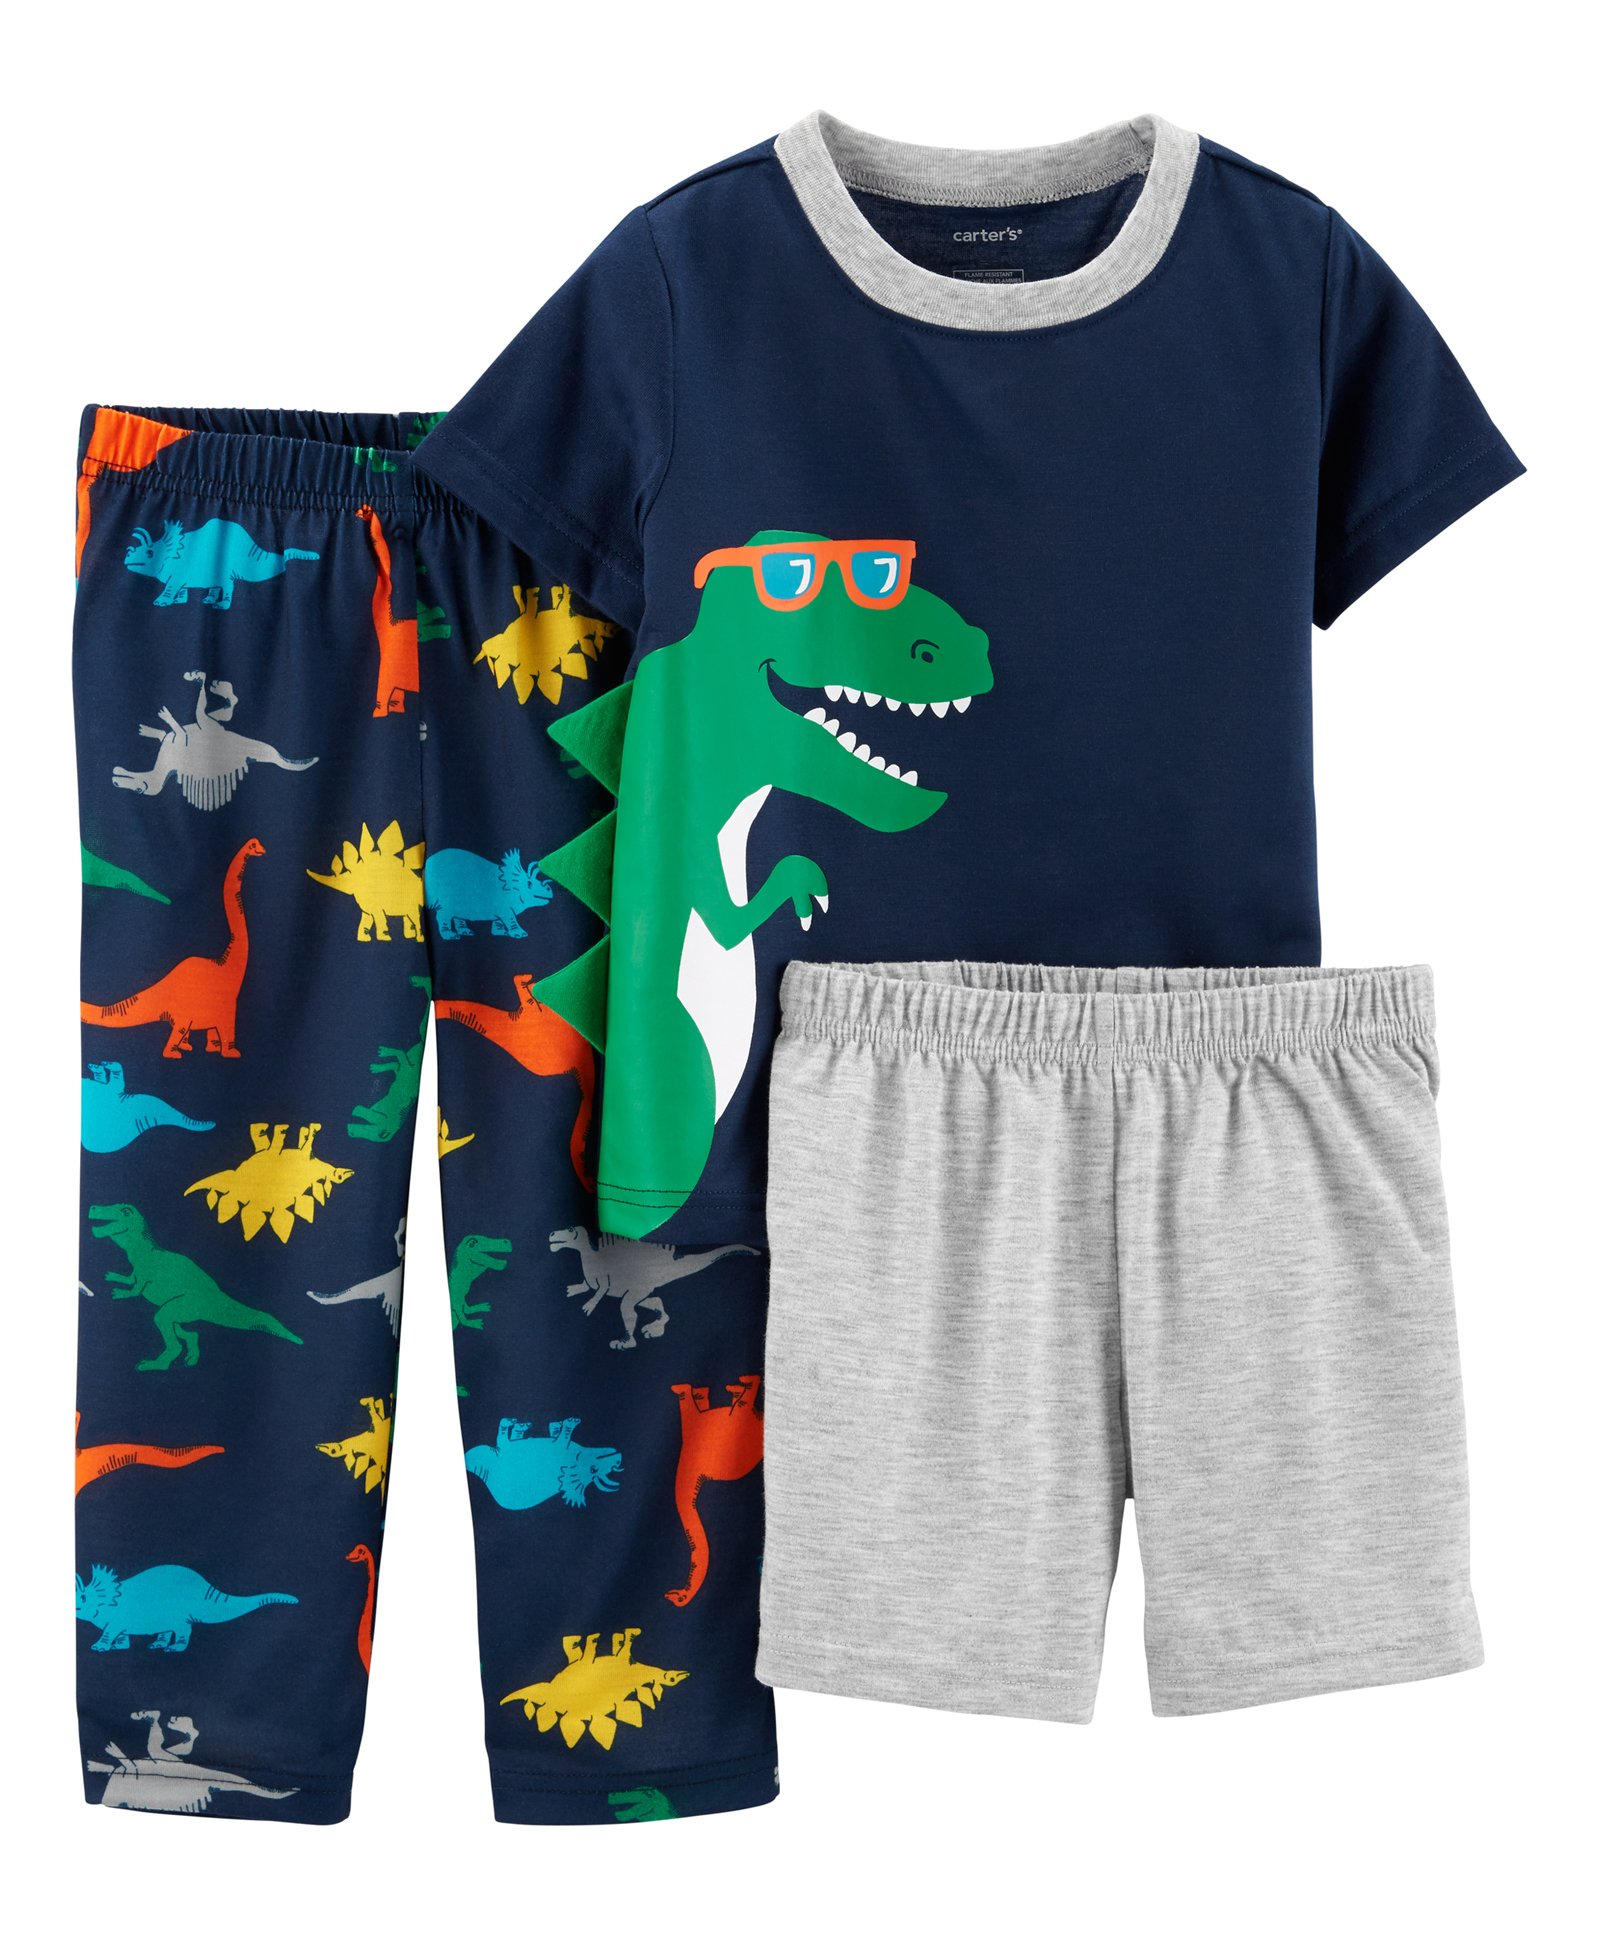 4778c7e8d Buy Carters 3Piece Dinosaur Poly PJs Navy Blue Grey for Boys (5-6 ...